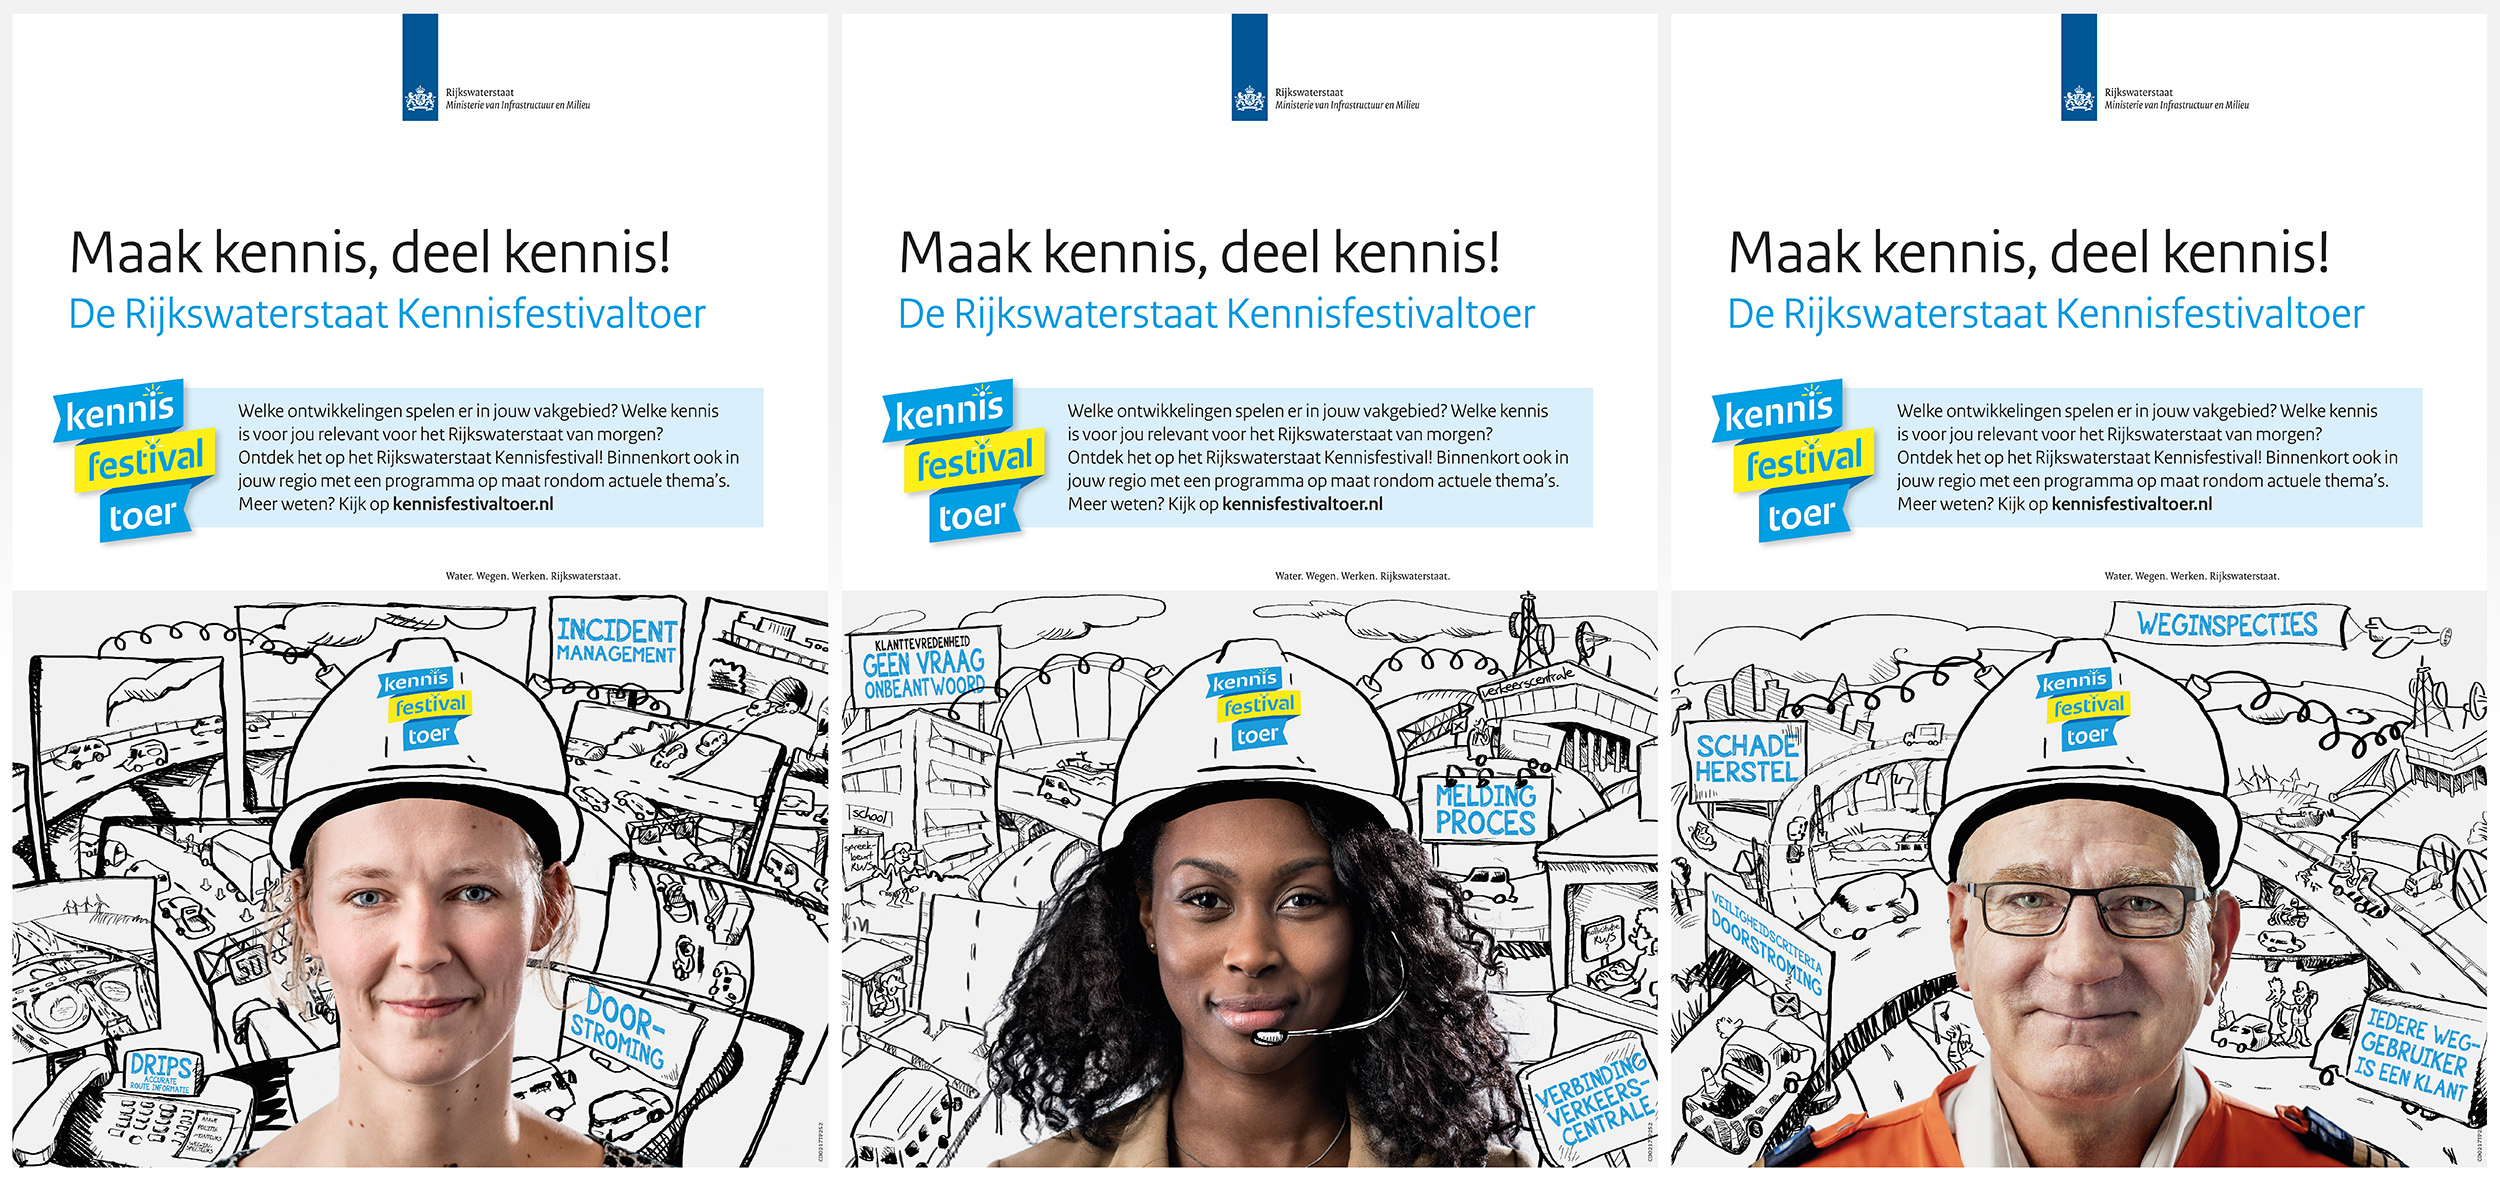 Tappan: De Rijkswaterstaat Kennisfestivaltoer